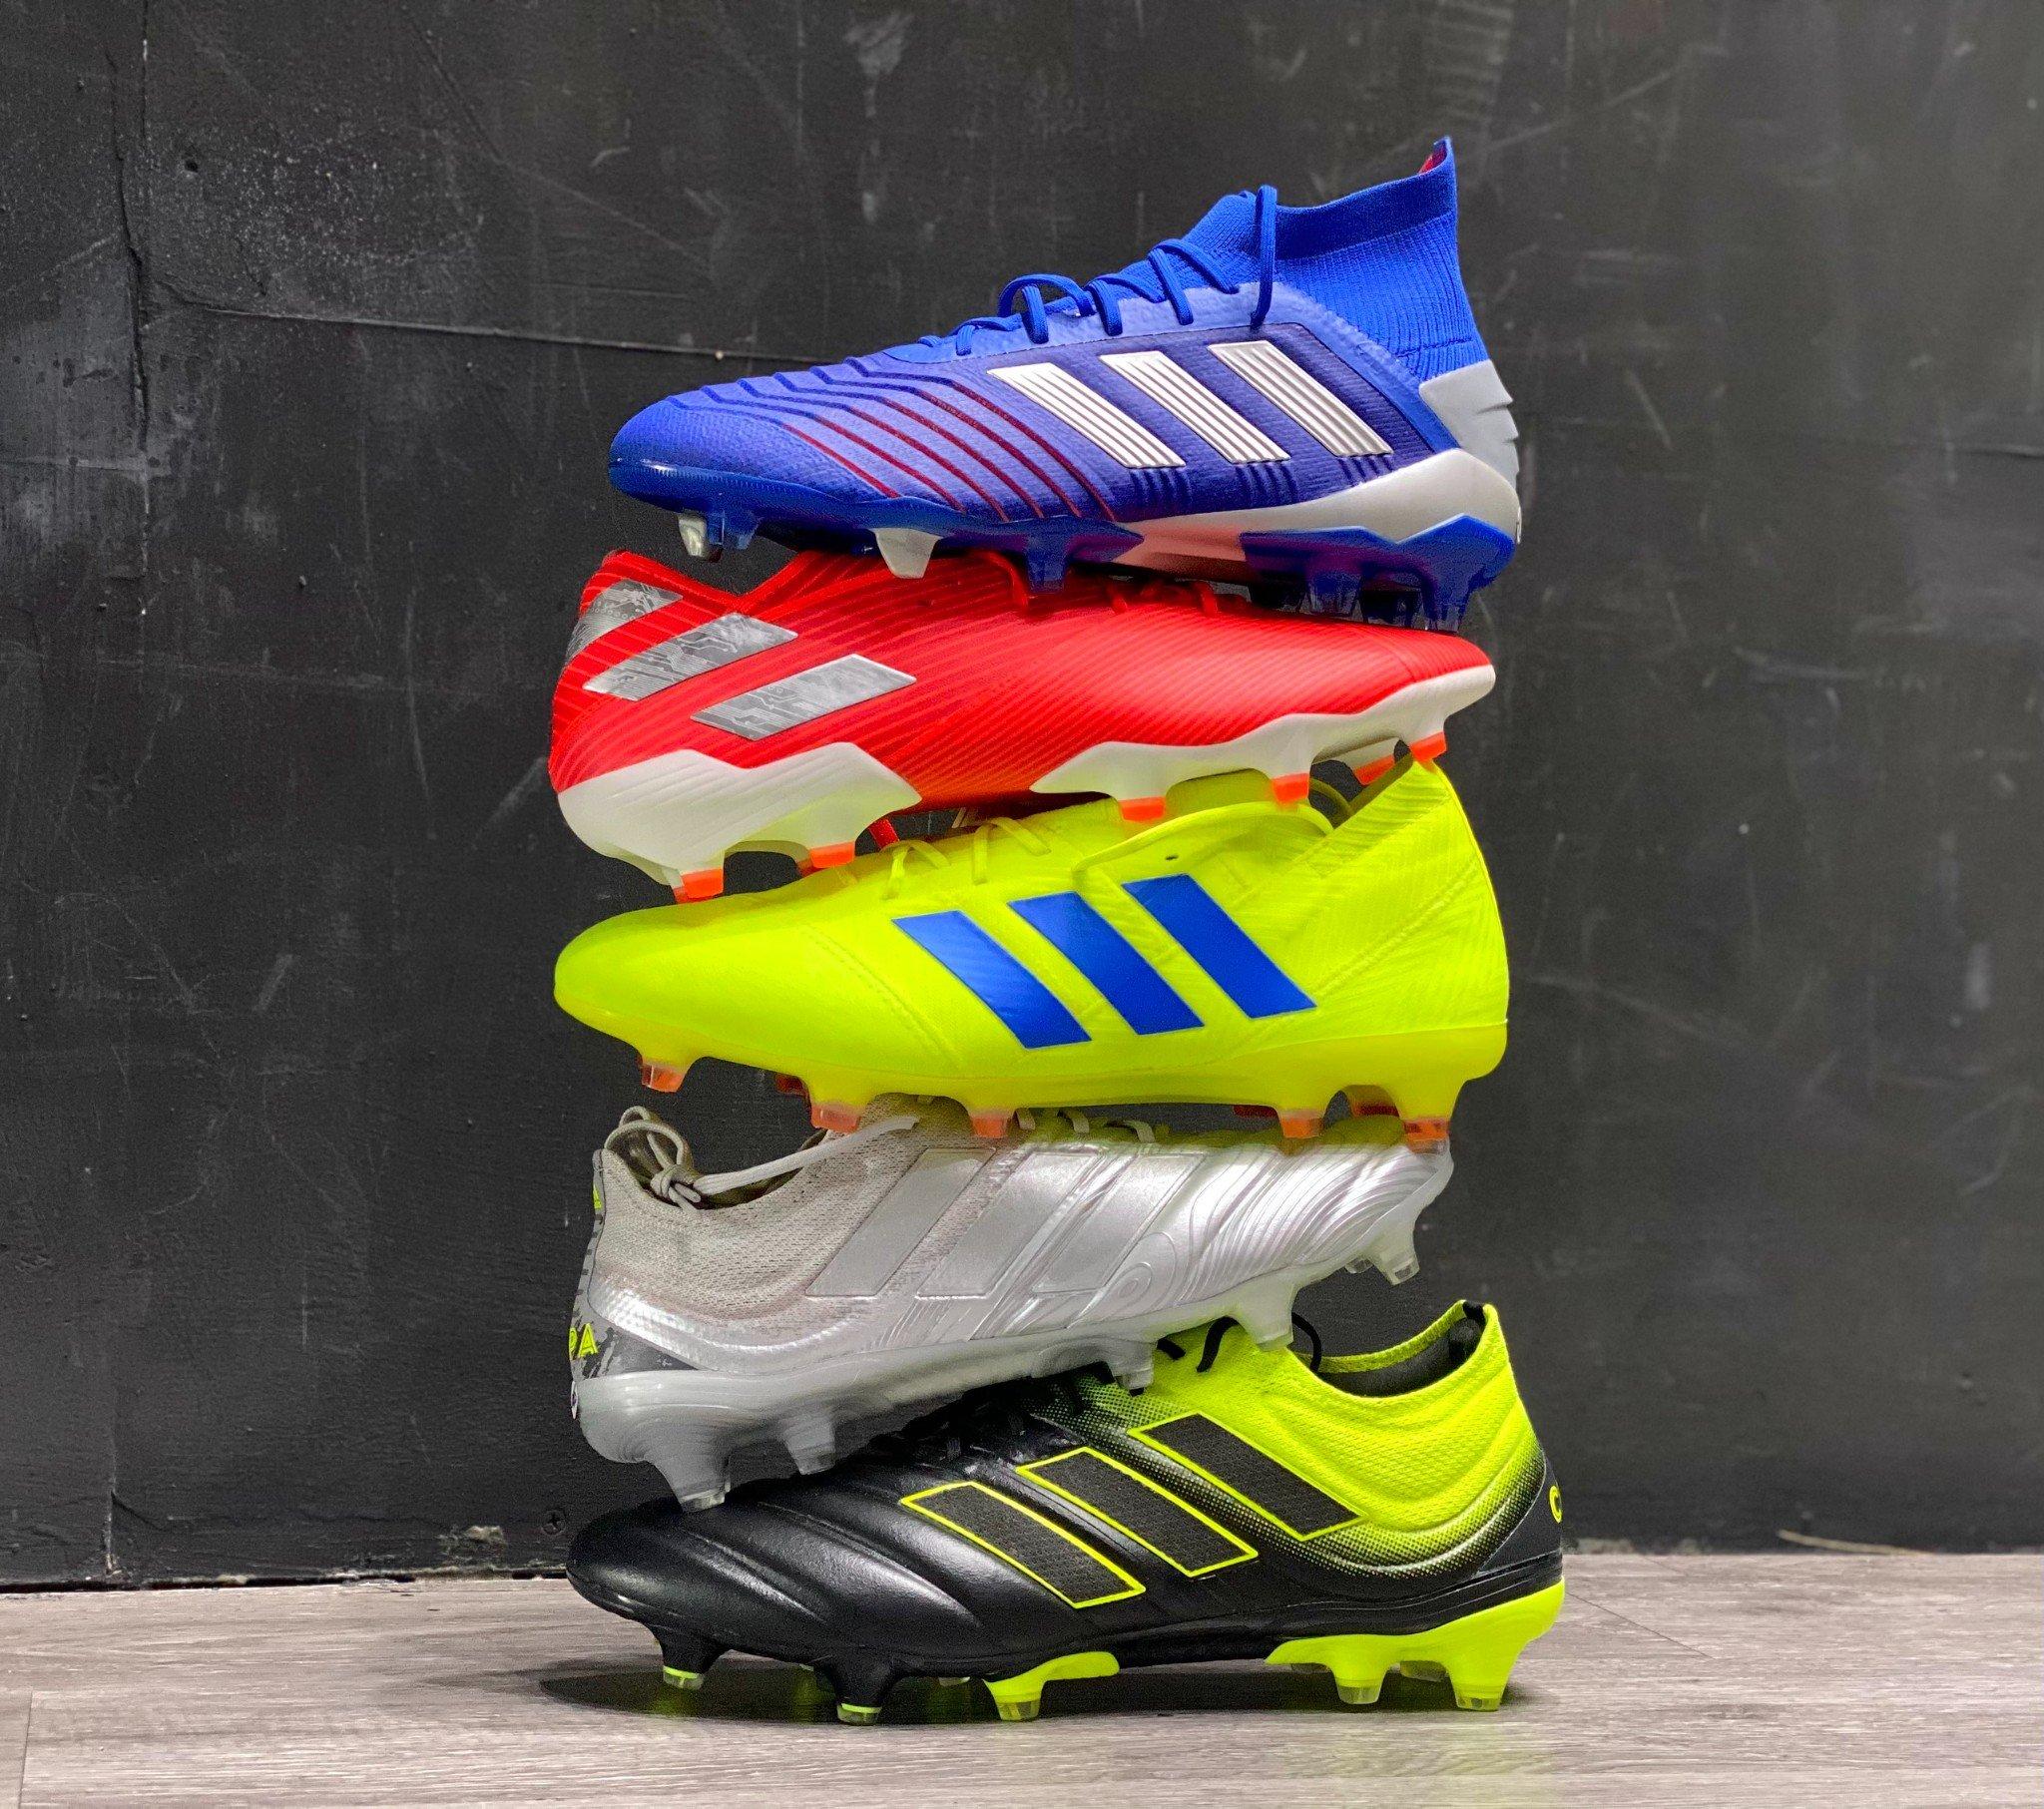 Giày đá bóng adidas giảm giá 50%